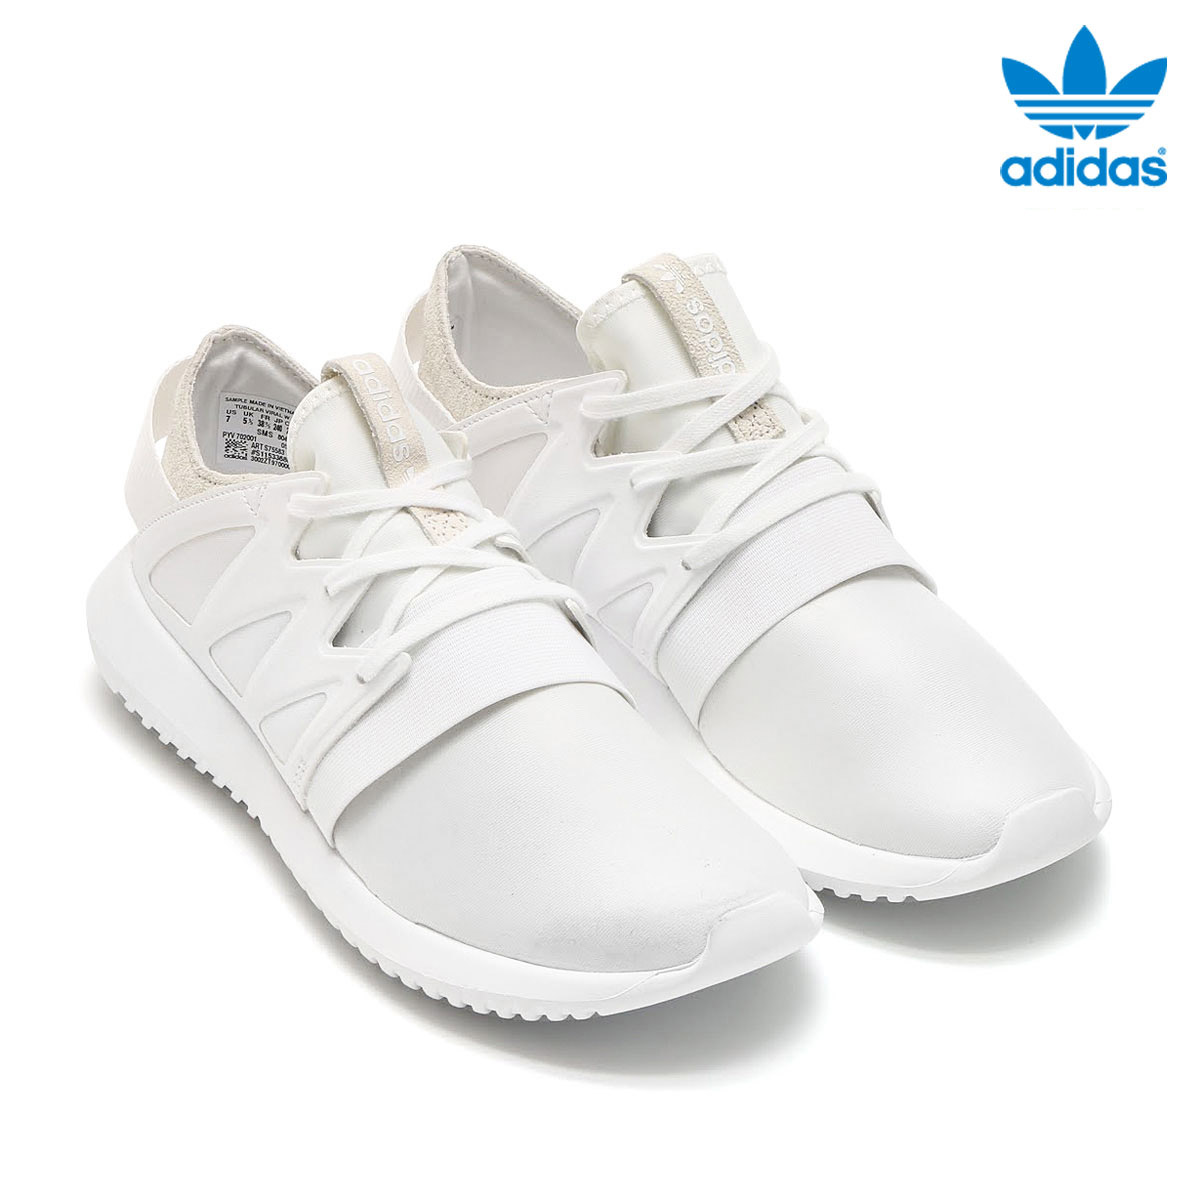 adidas Originals TUBULAR VRL W(アディダス オリジナルス チューブラー)(Core White/Core White/Core White)【レディース スニーカー】17SS-I